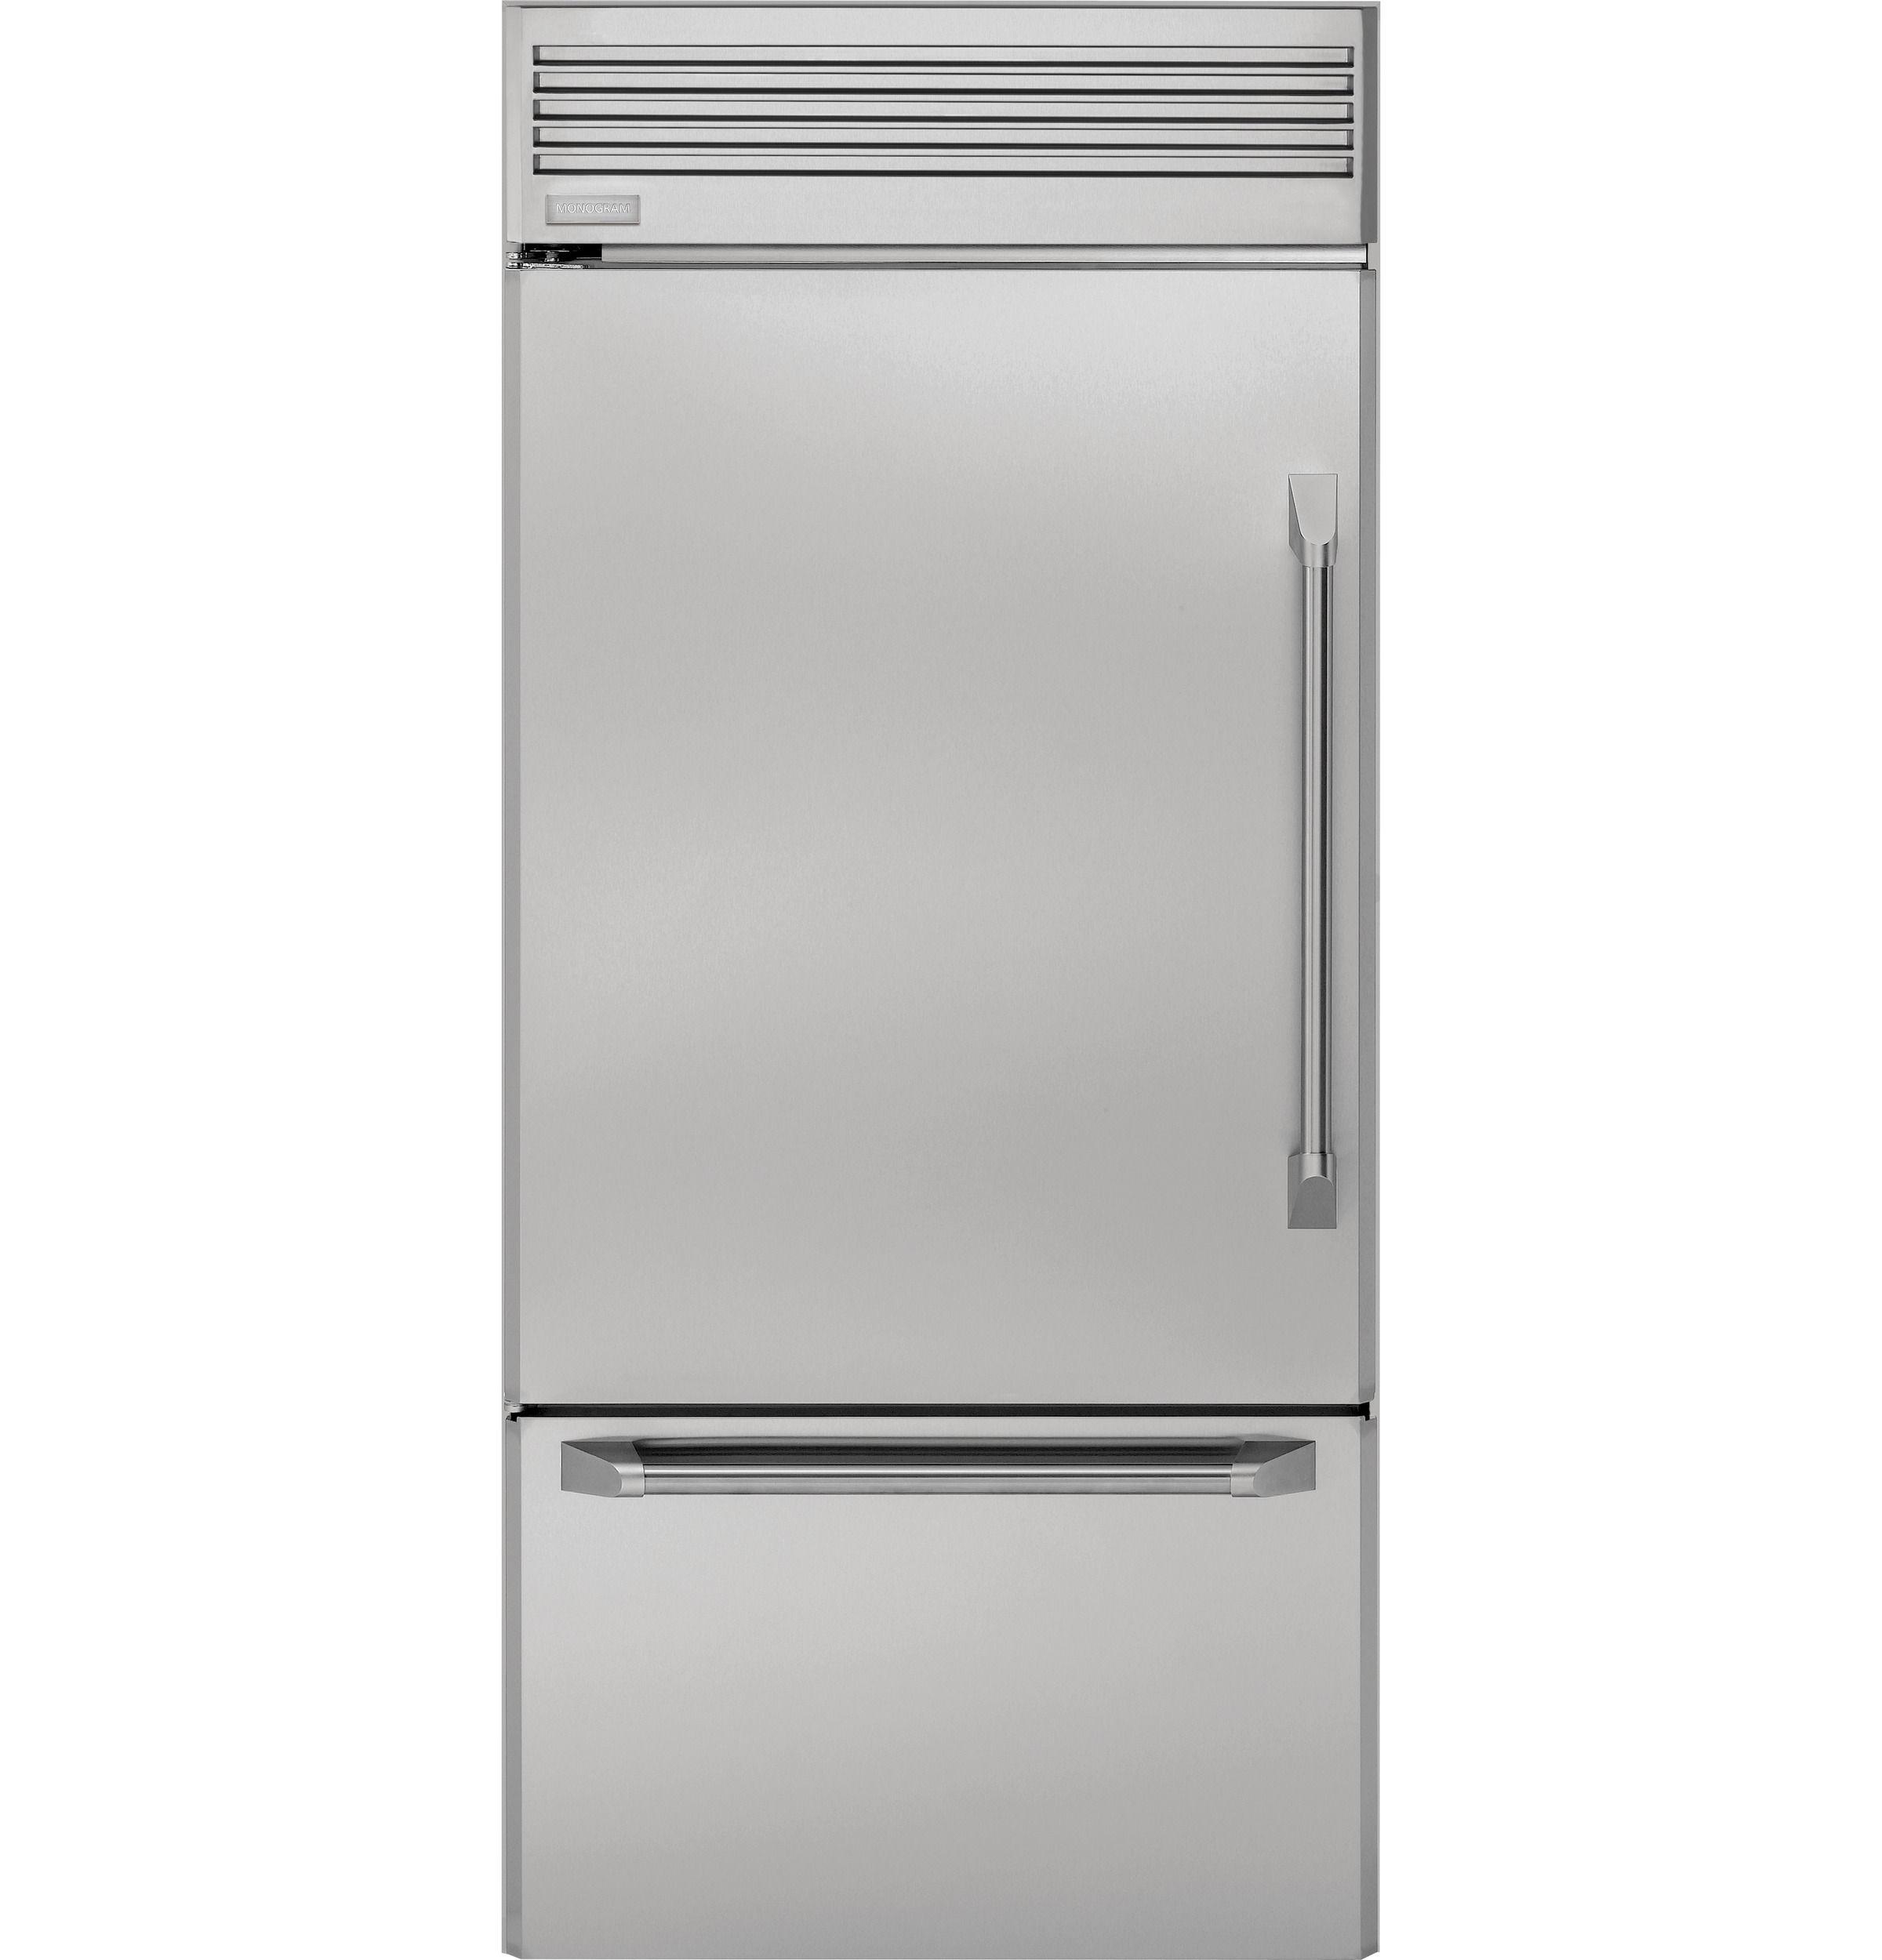 Zicp360nhlh Monogram 36 Professional Built In Bottom Freezer Refrigerator Monogram Appliances Bottom Freezer Refrigerator Monogram Refrigerator